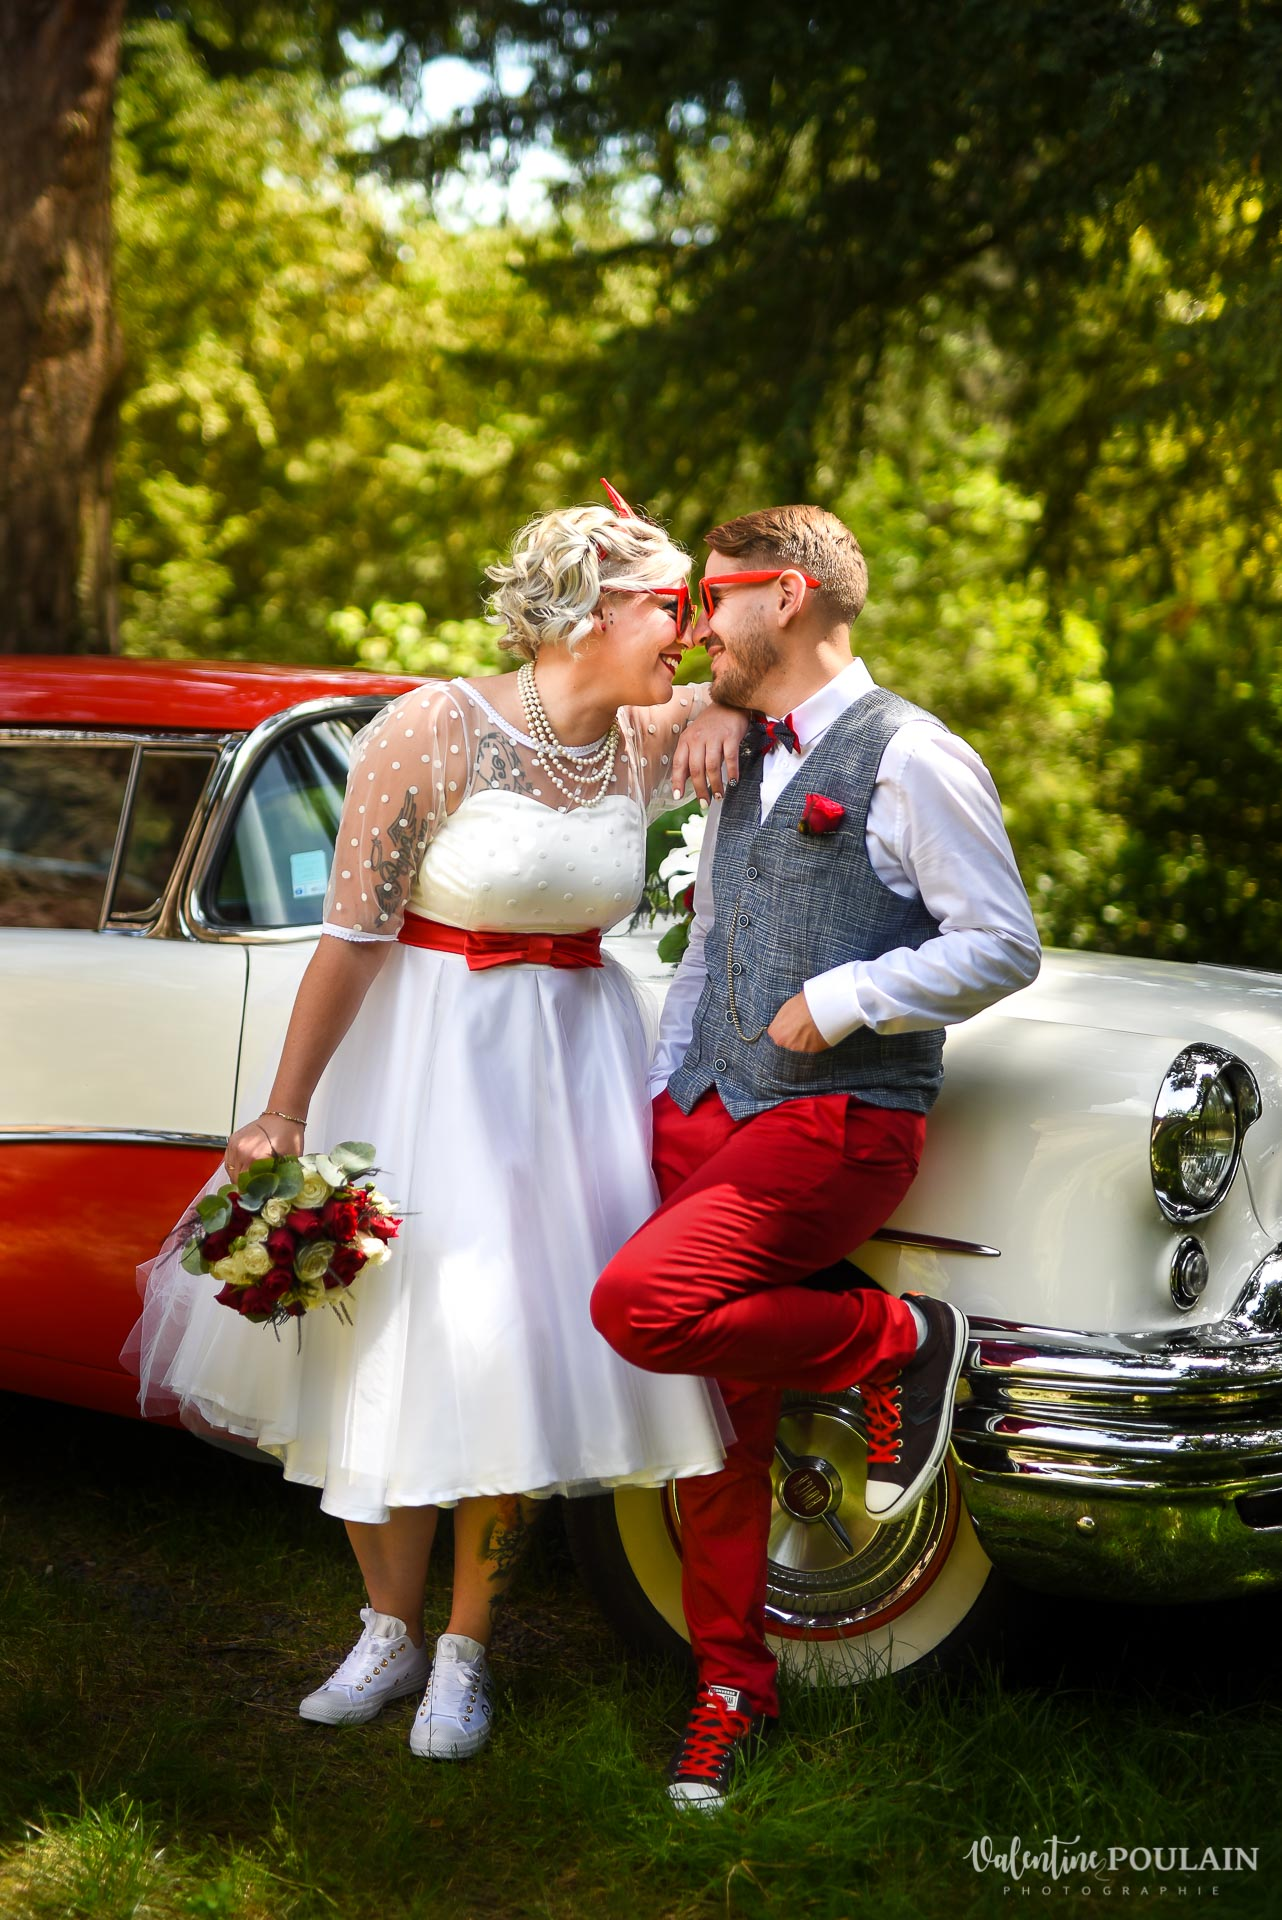 Mariage vintage rockabilly - Valentine Poulain - couple regard